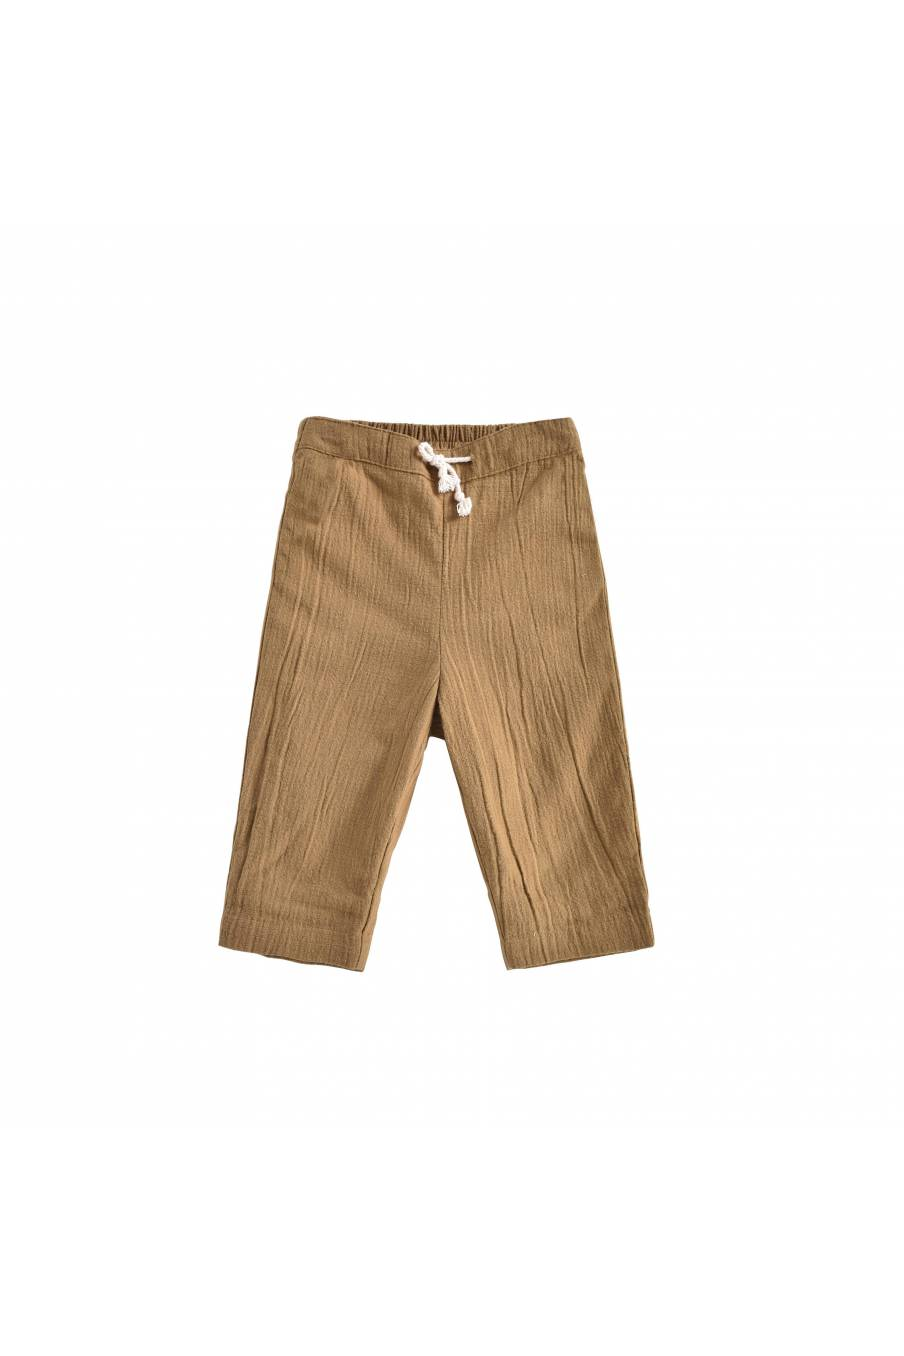 boheme chic vintage pantalon bébé garcon acilu kaki